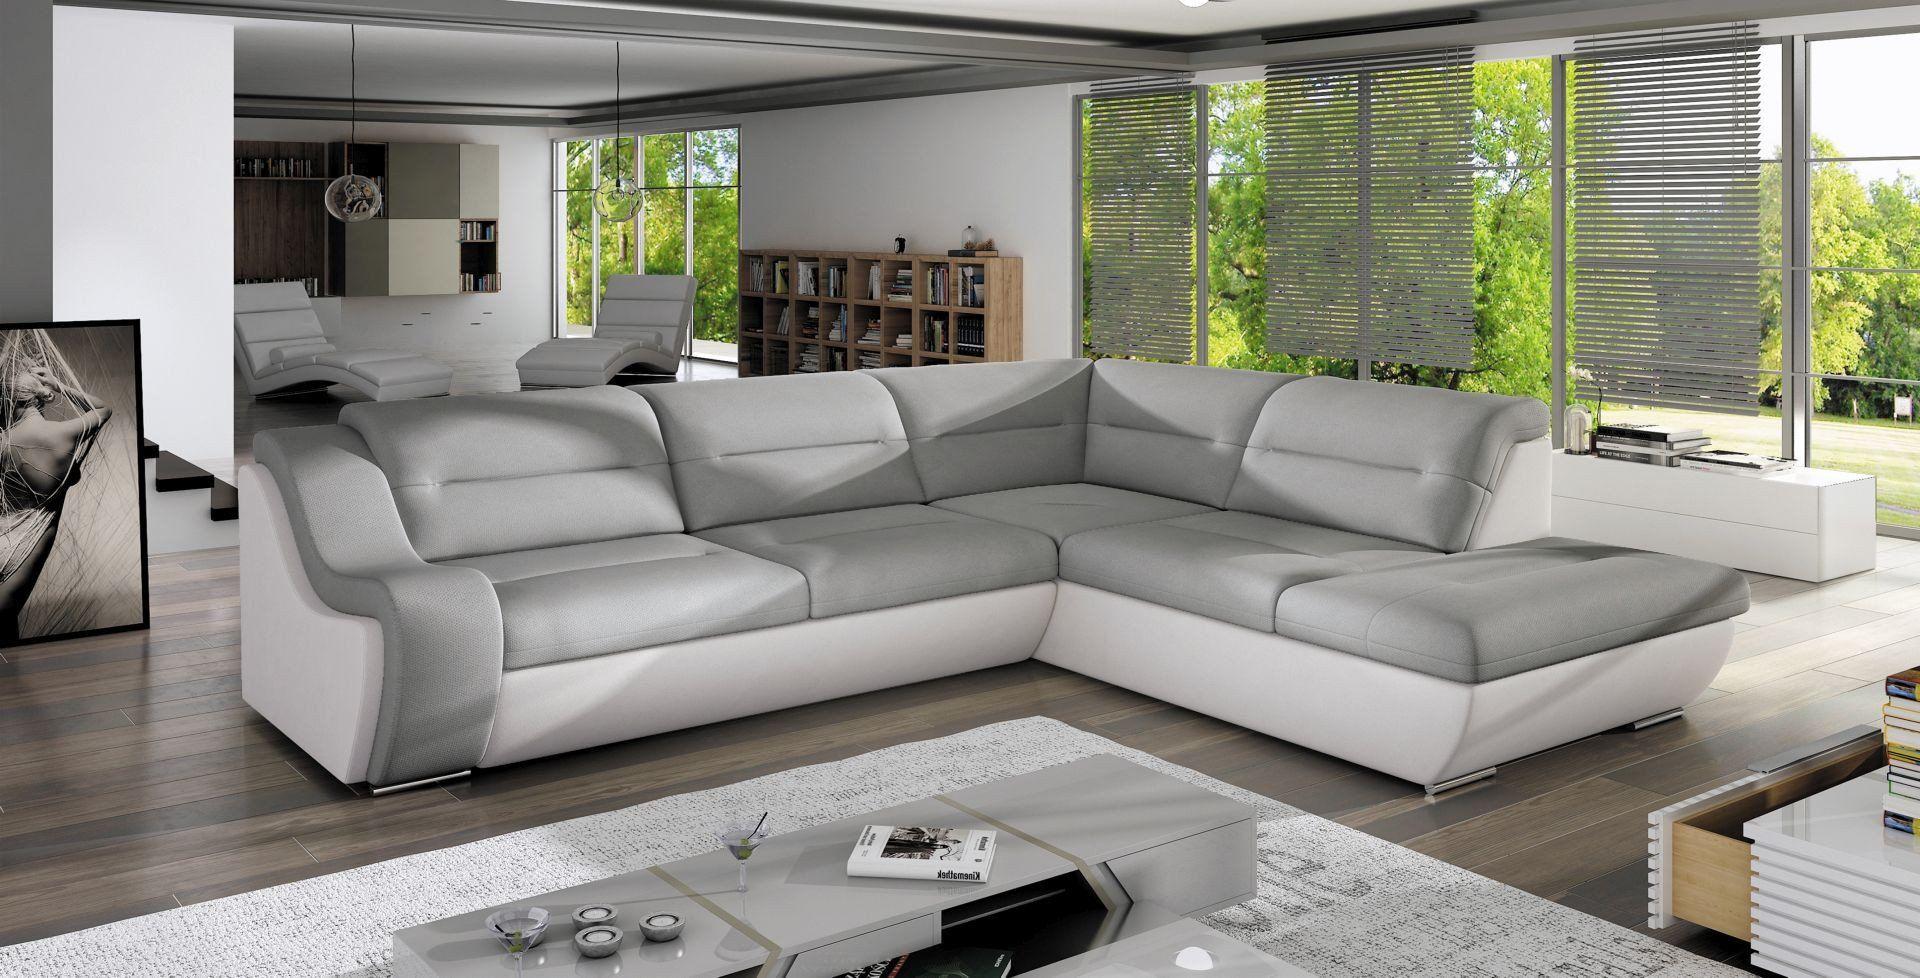 Now 859 Inc Vat Instalments 12 Months 0 Free Delivery The Unique Corner Sofa Bed Galaxy C Wi Corner Sofa Bed Built In Sofa Corner Sofa